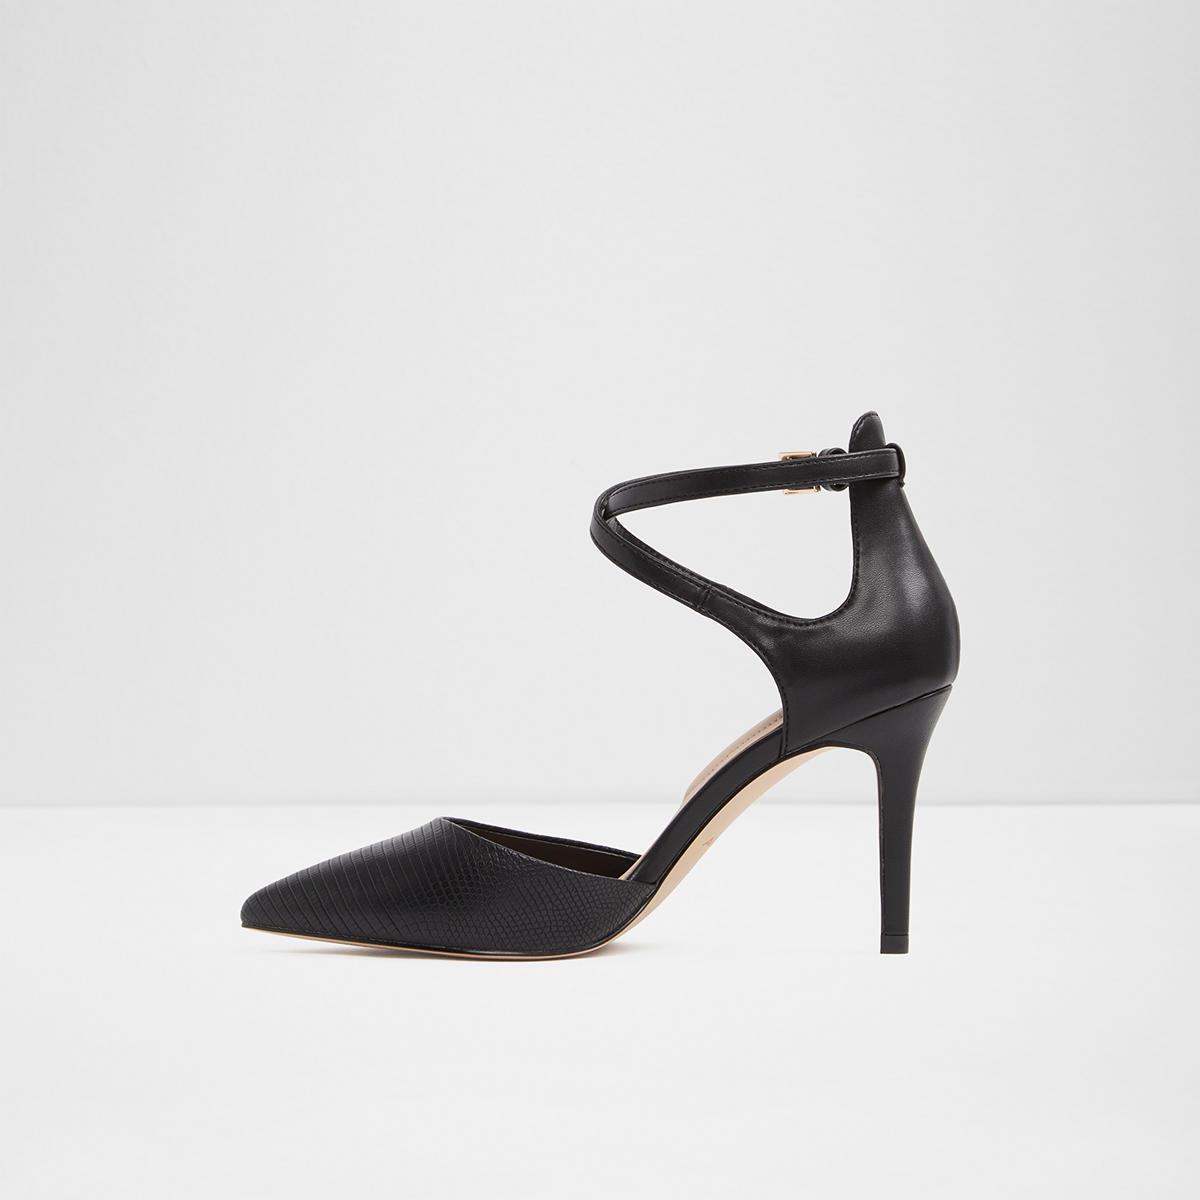 4c4f274c56 Thaecia Black Women s Heels